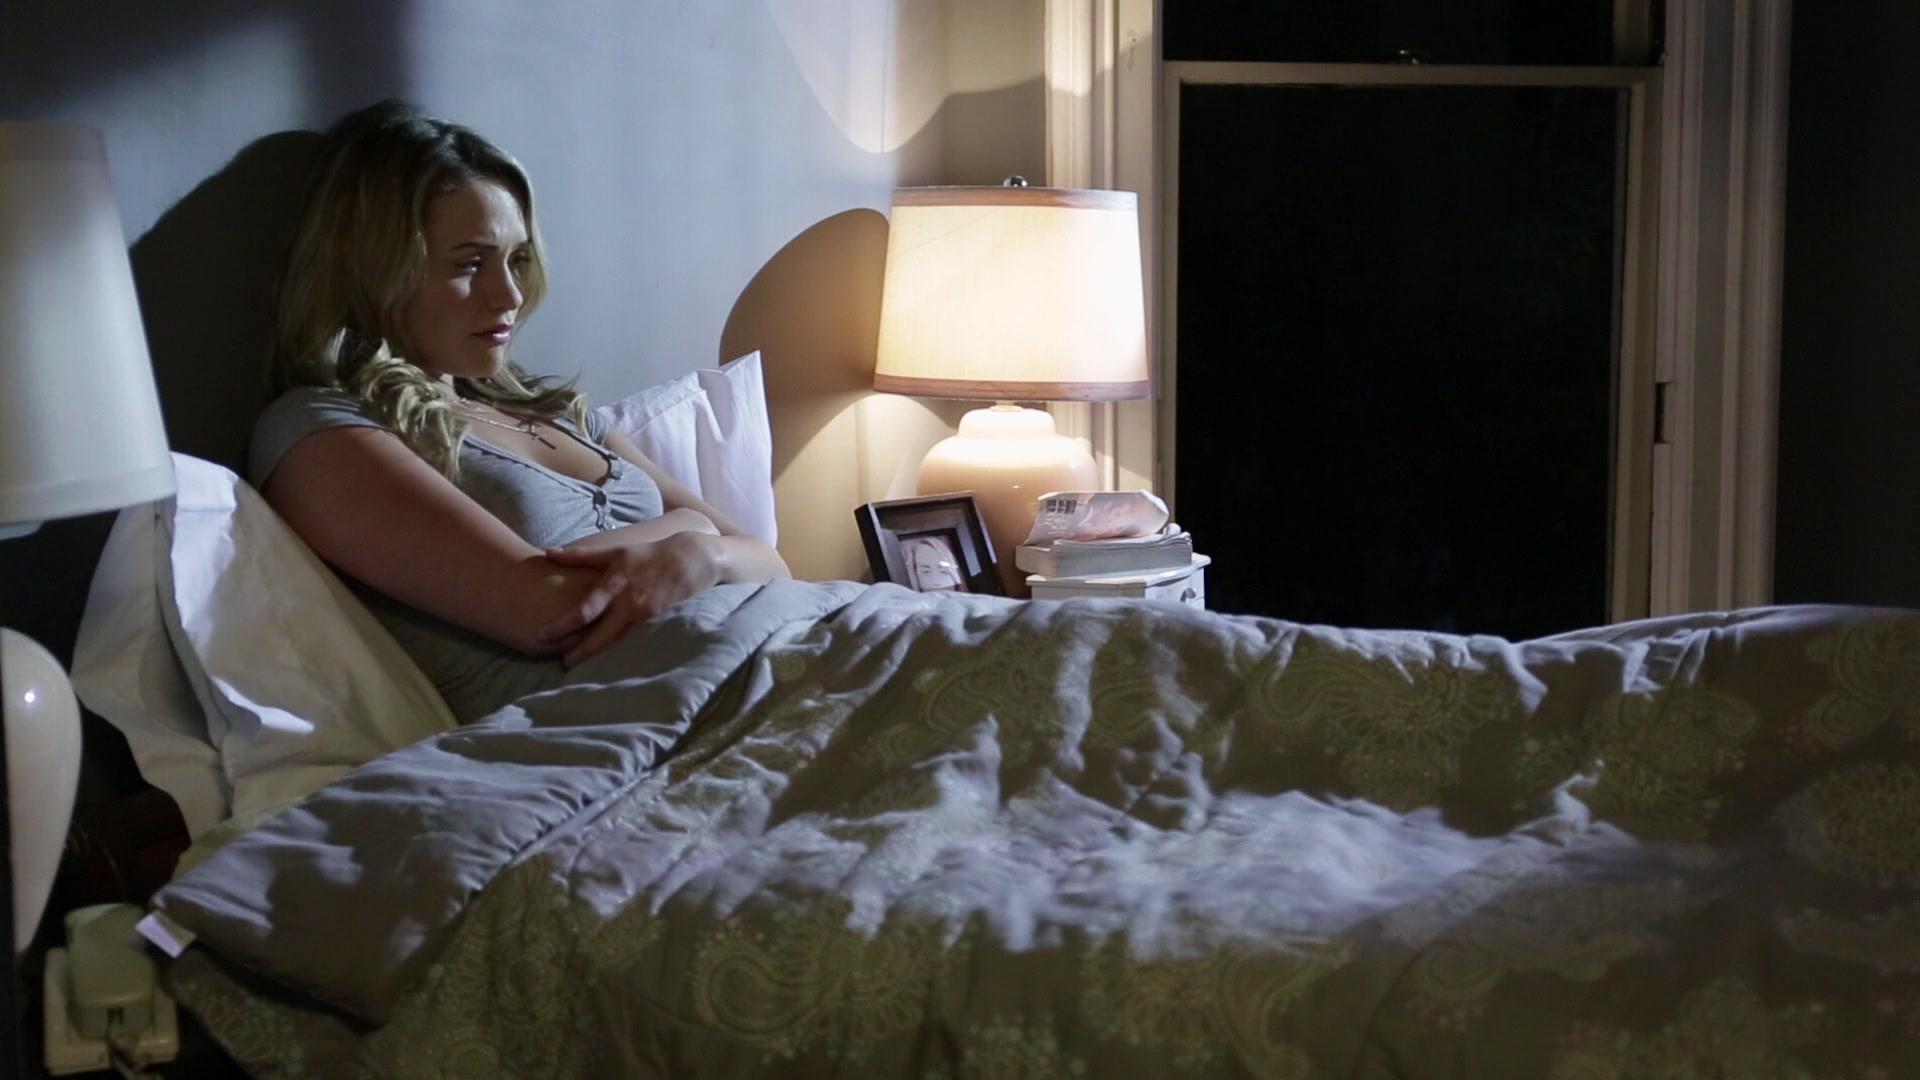 Mia Malkova Pleasures Herself in Bed